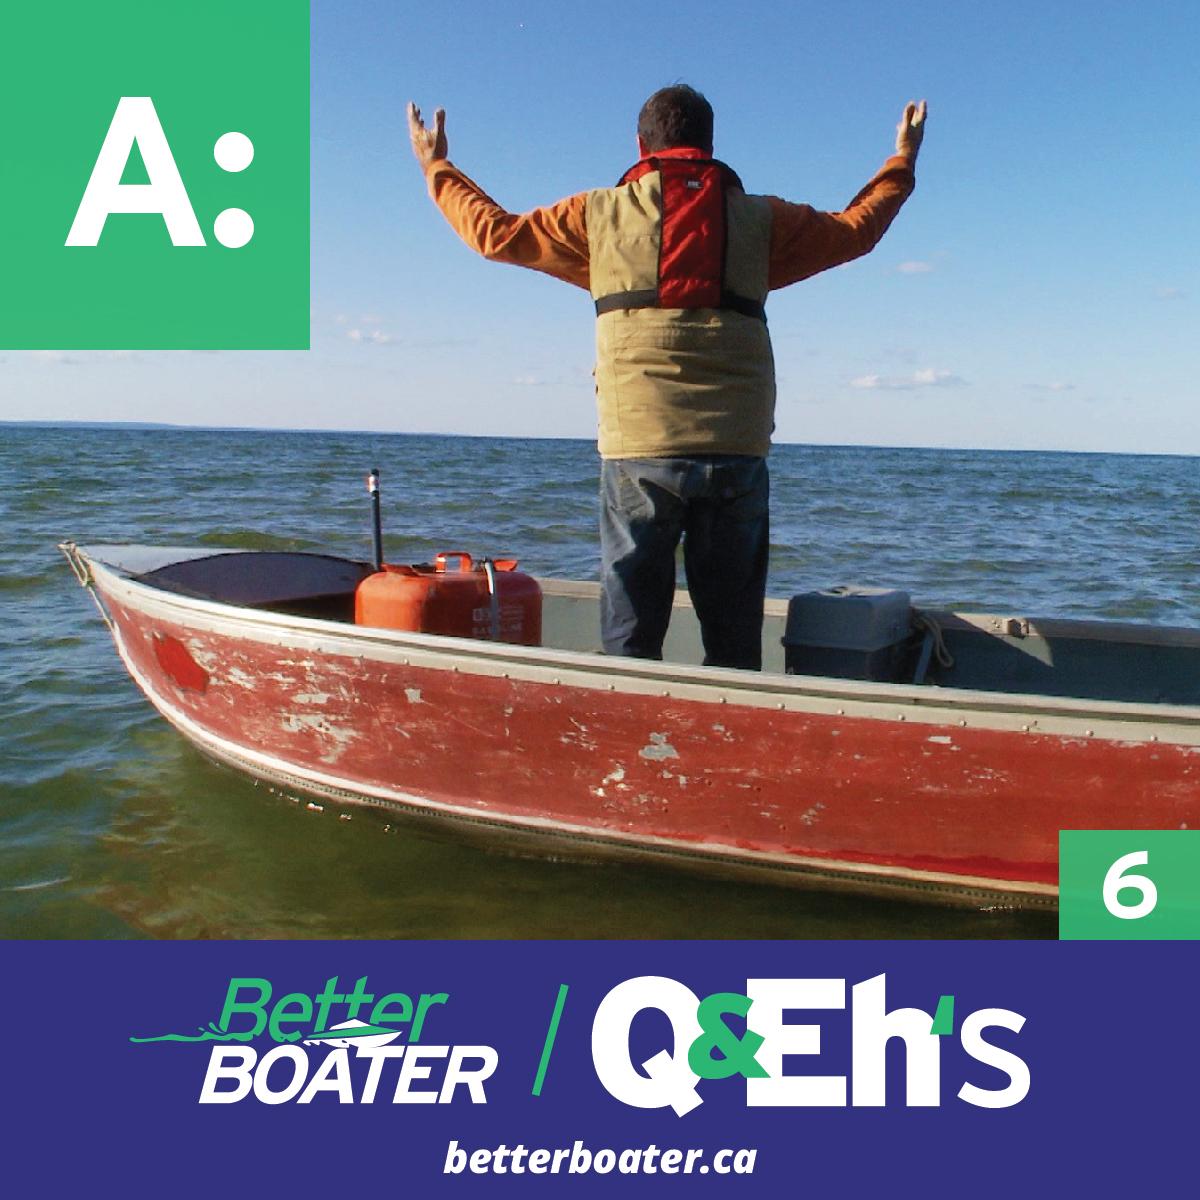 https://betterboater.ca/Q&Eh:%20Mechanical%20Failure